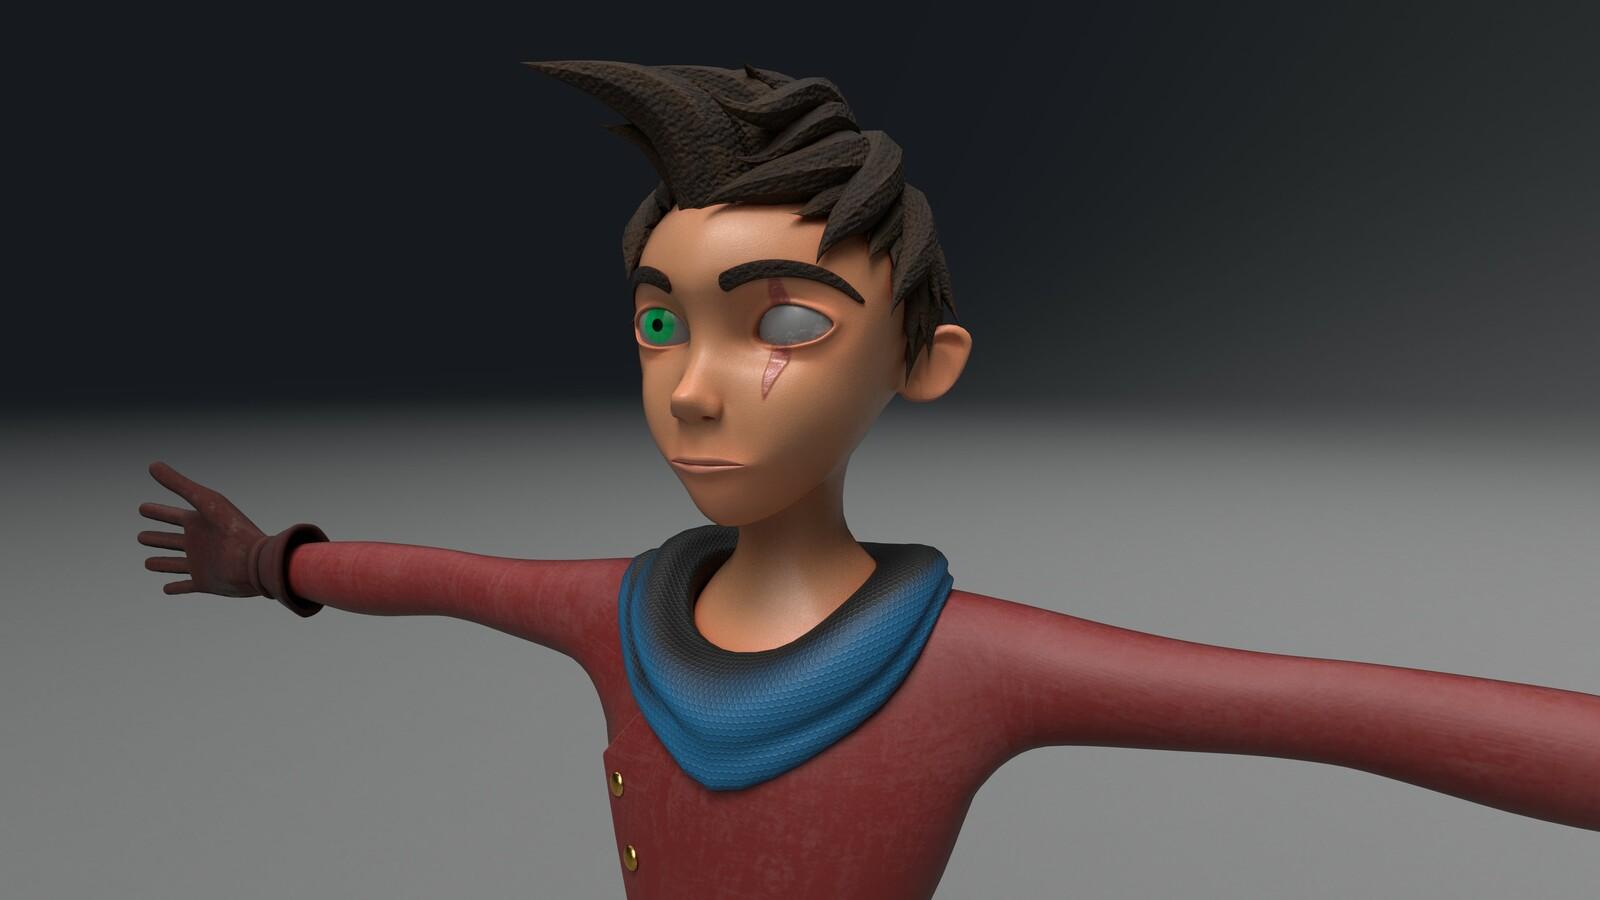 Adventure Character